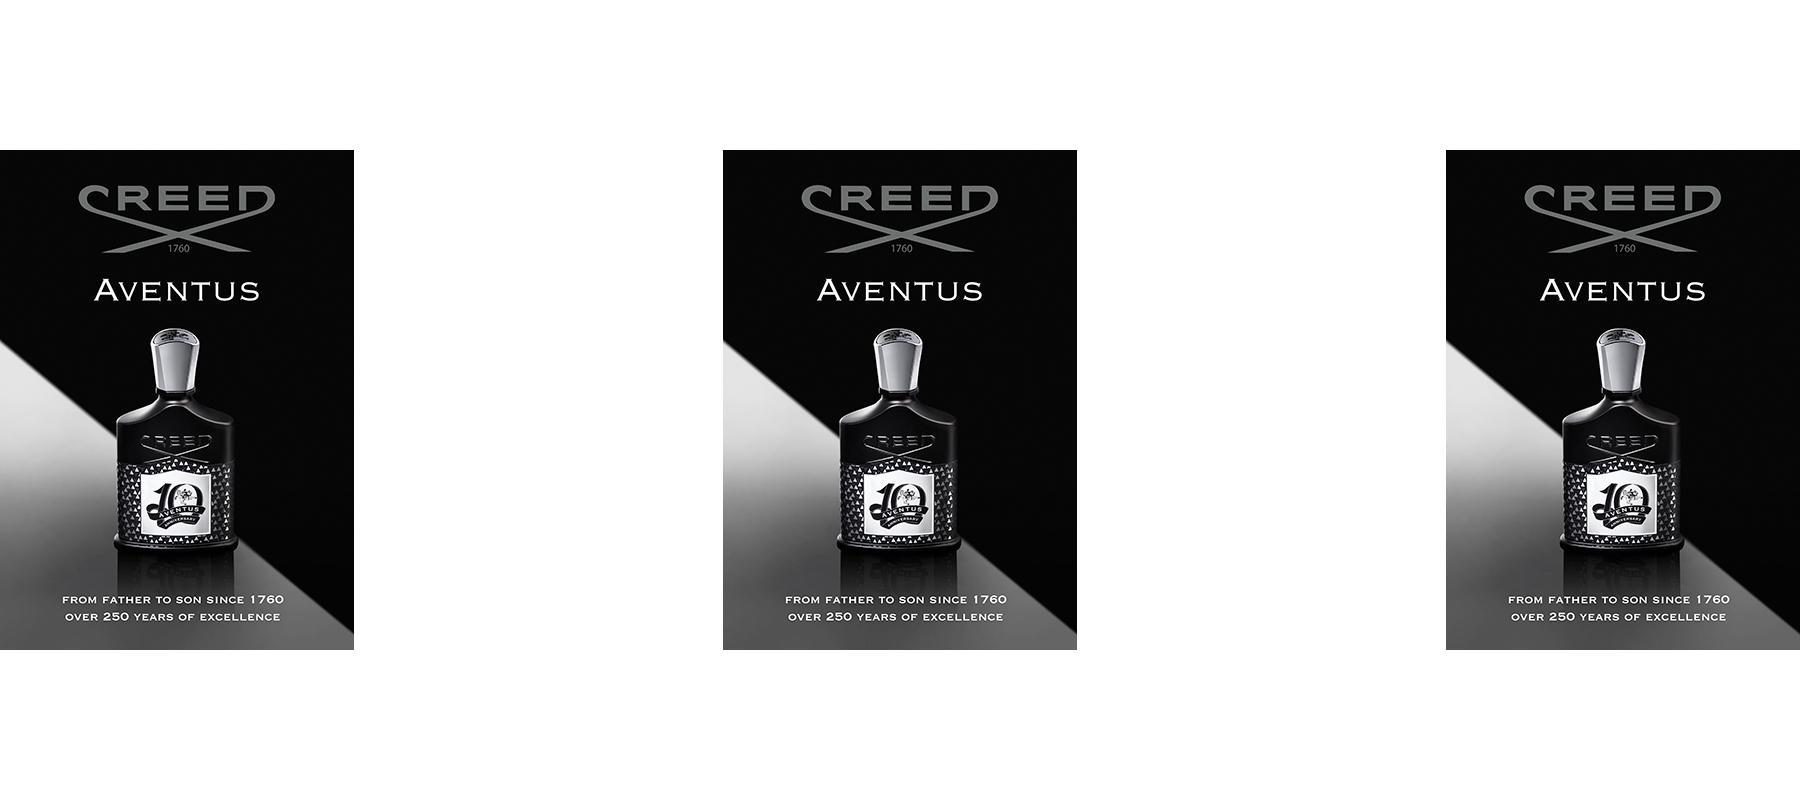 Creed Aventus 10th anniversary